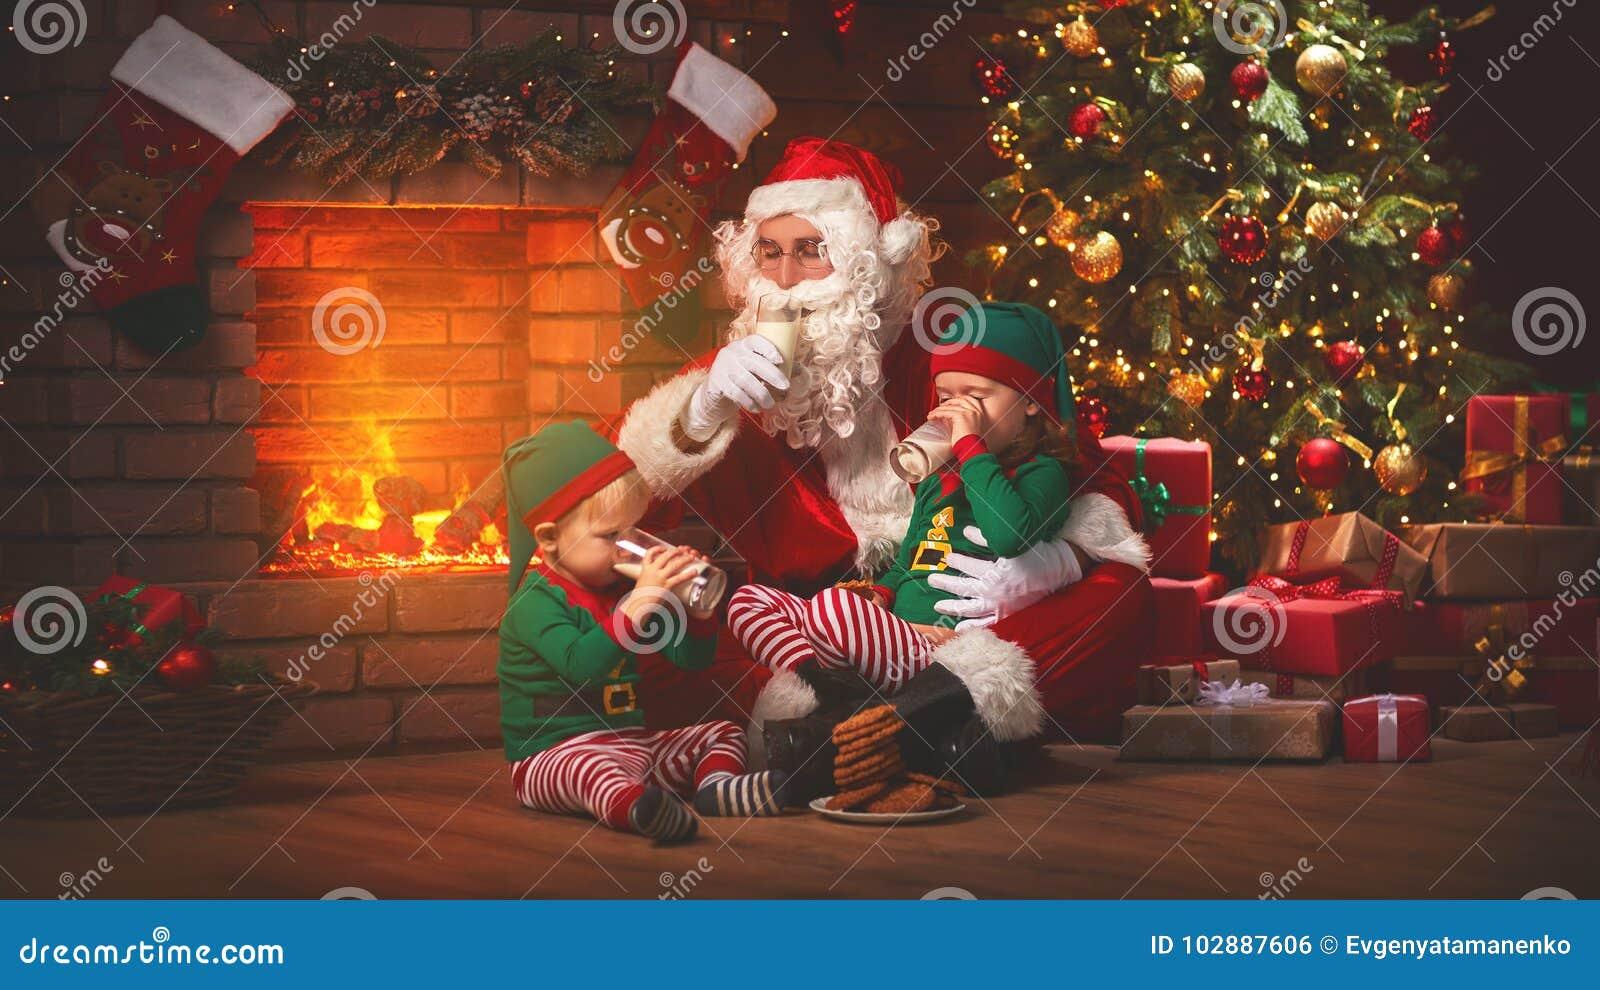 Kerstmis Santa Claus met Elf drinkt Melk en eet Koekjes